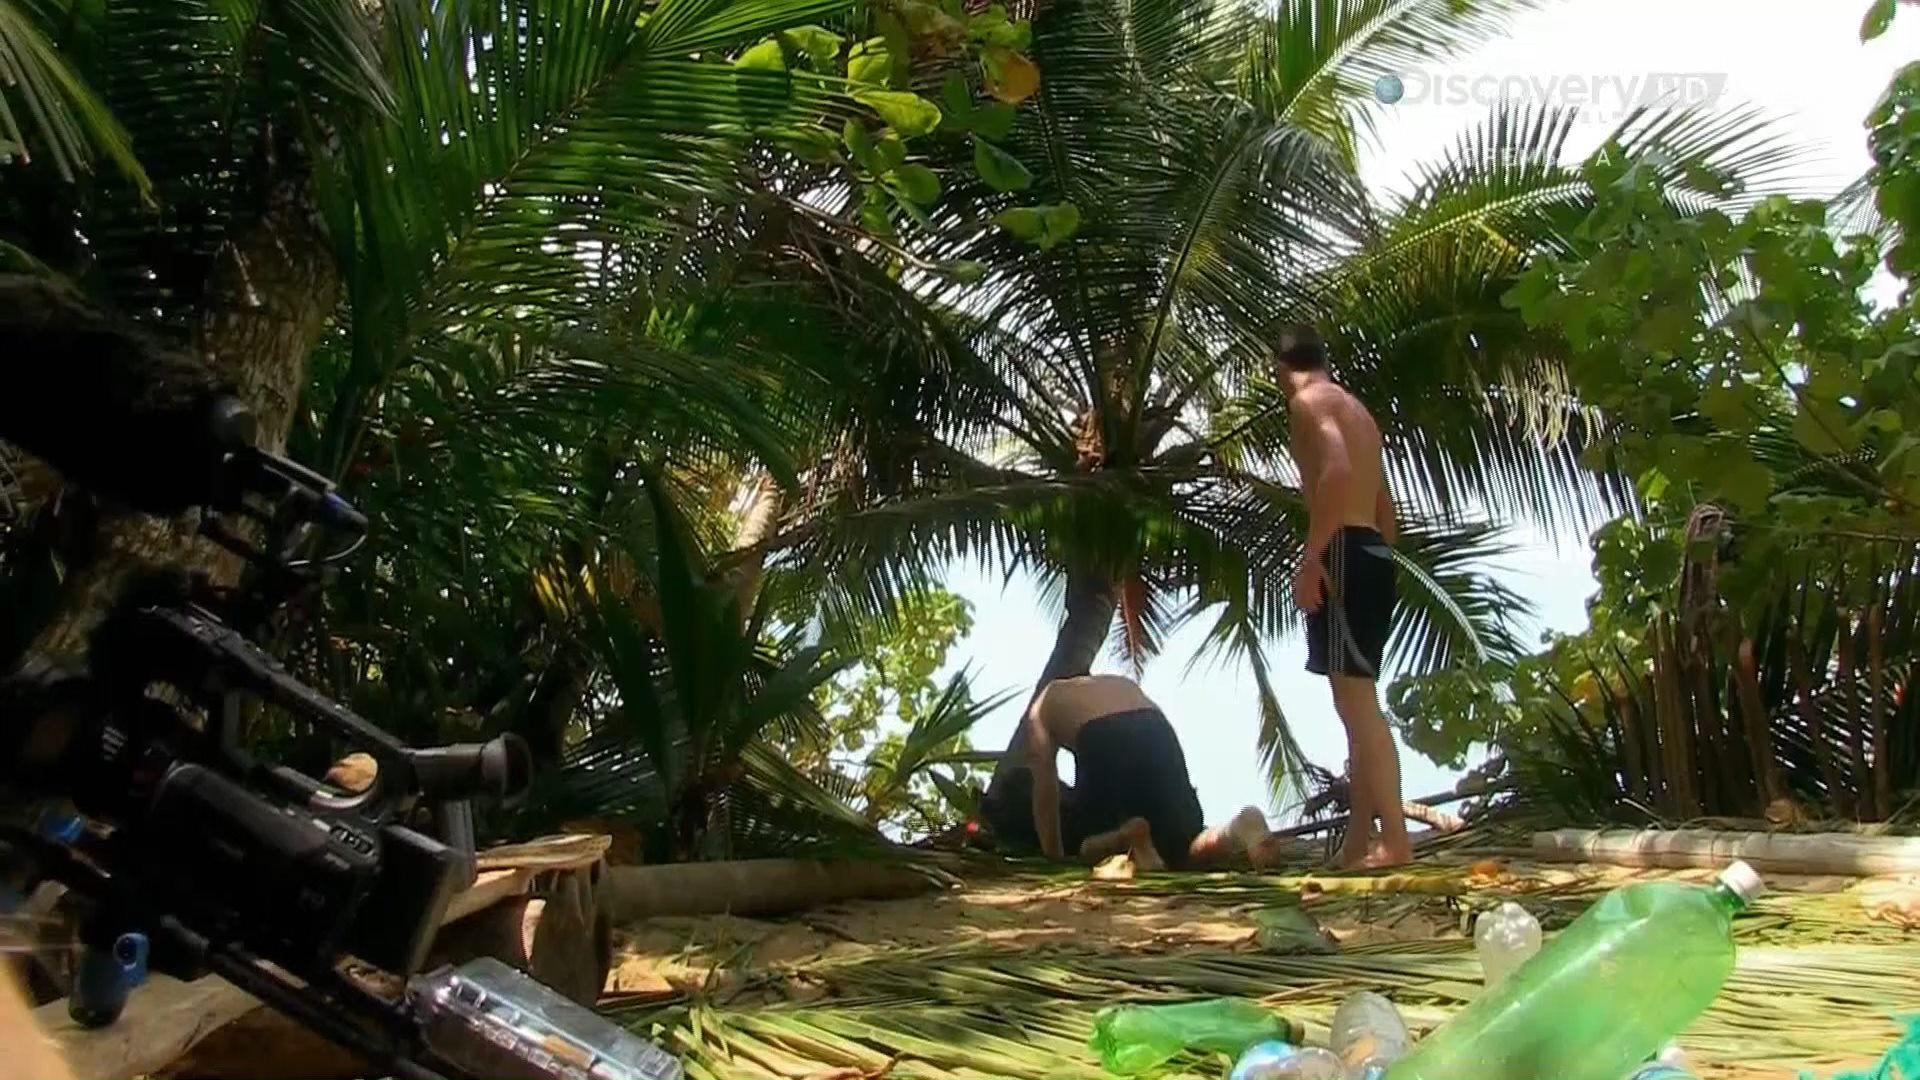 Discovery. Остров с Беаром Гриллсом / The Island with Bear Grylls [01] (2014) HDTV 1080i